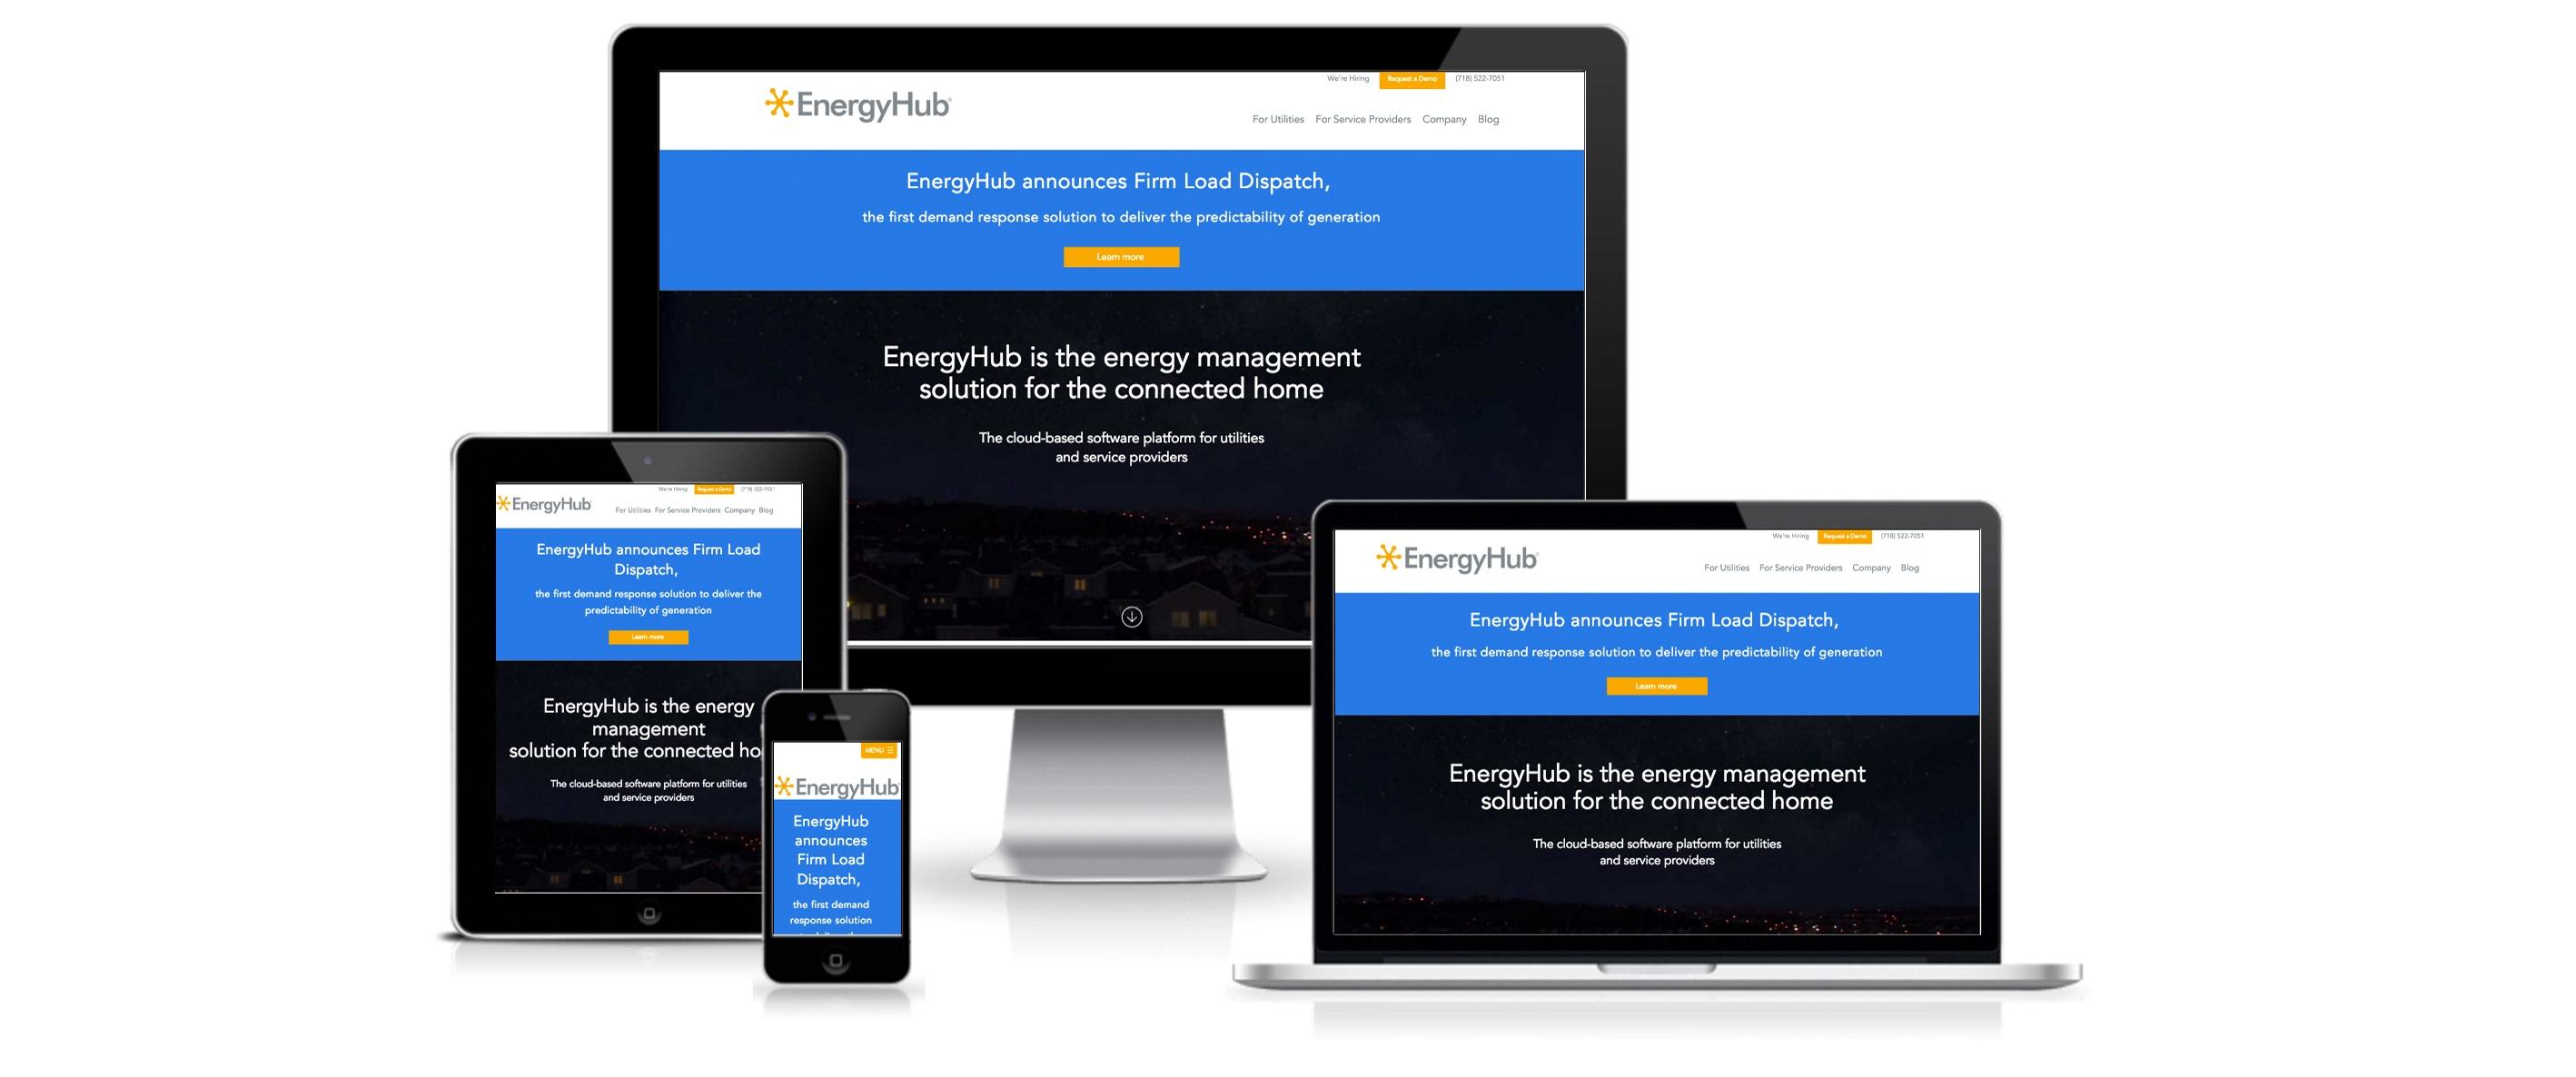 HubSpot Website Design for EnergyHub - Created By Spoke